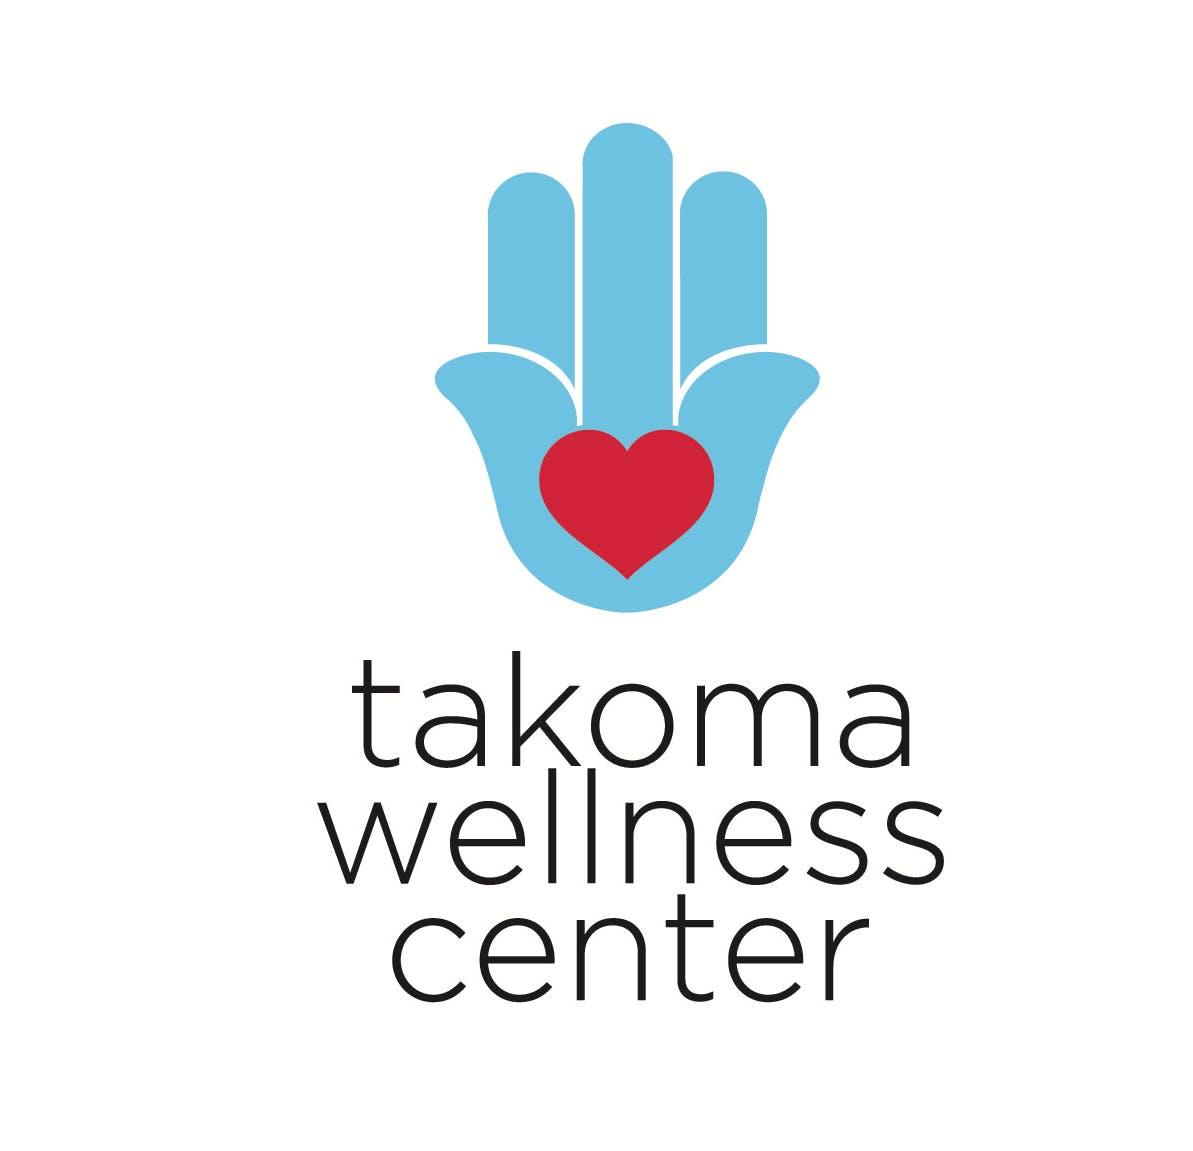 Takoma Wellness Center   Store